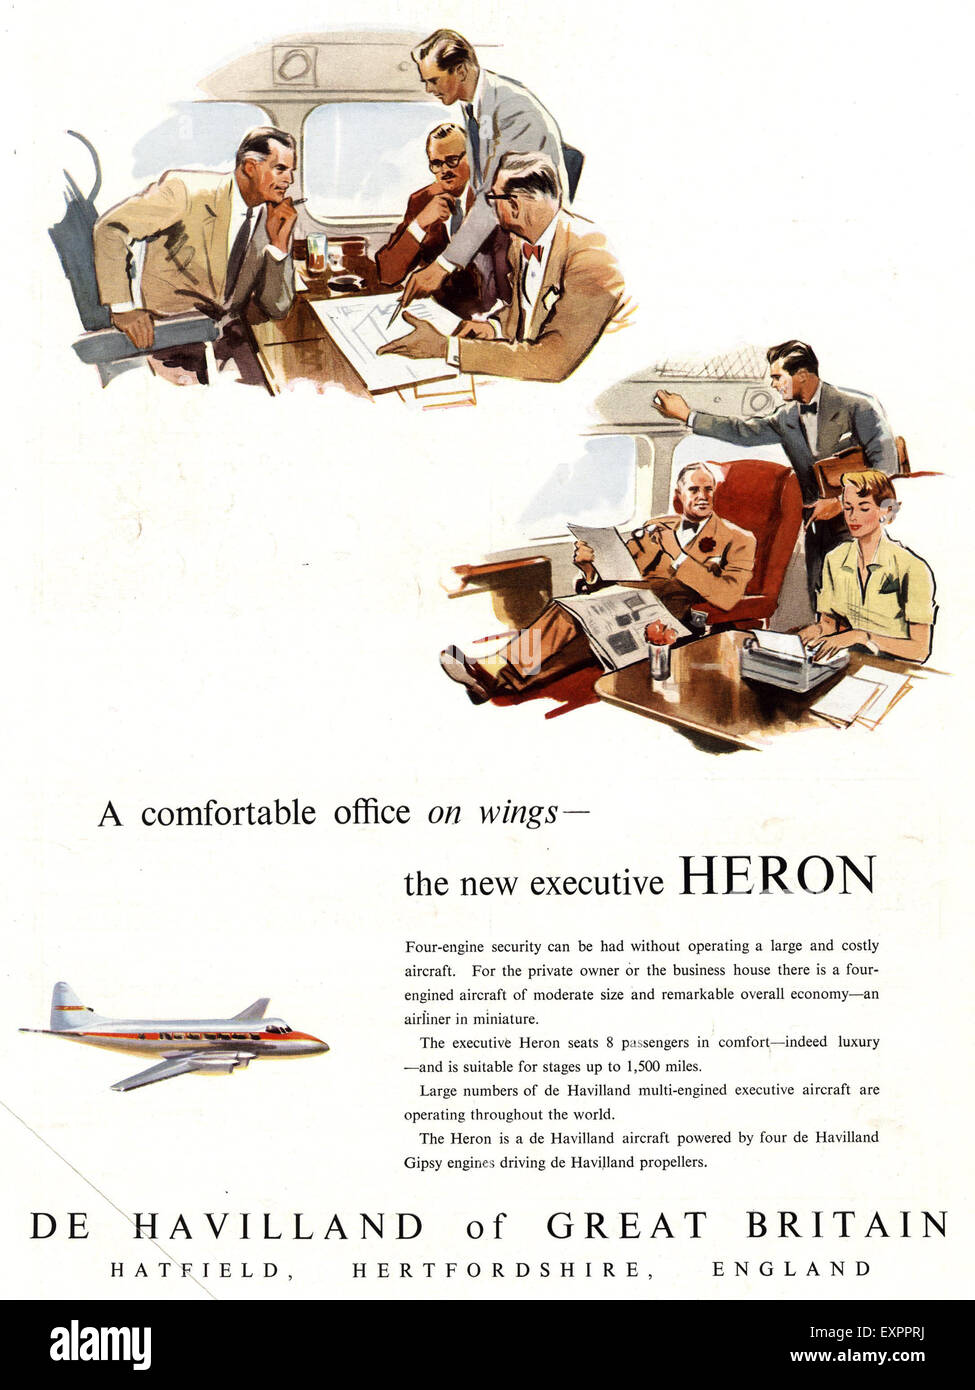 1950s UK Heron De Havilland Magazine Advert - Stock Image